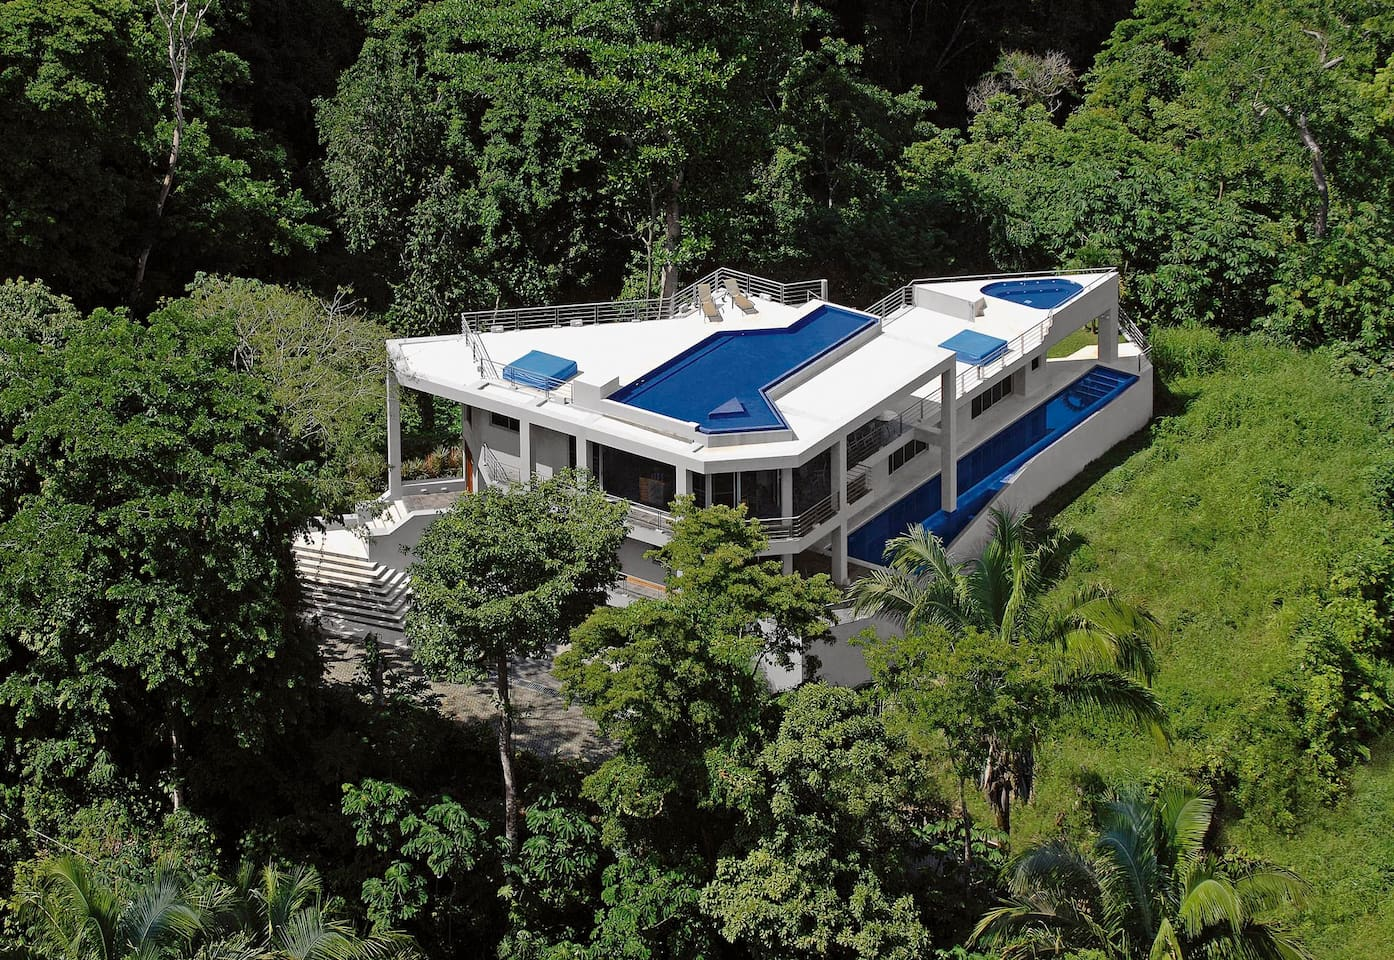 Aerial view of Casa de Pura Vida